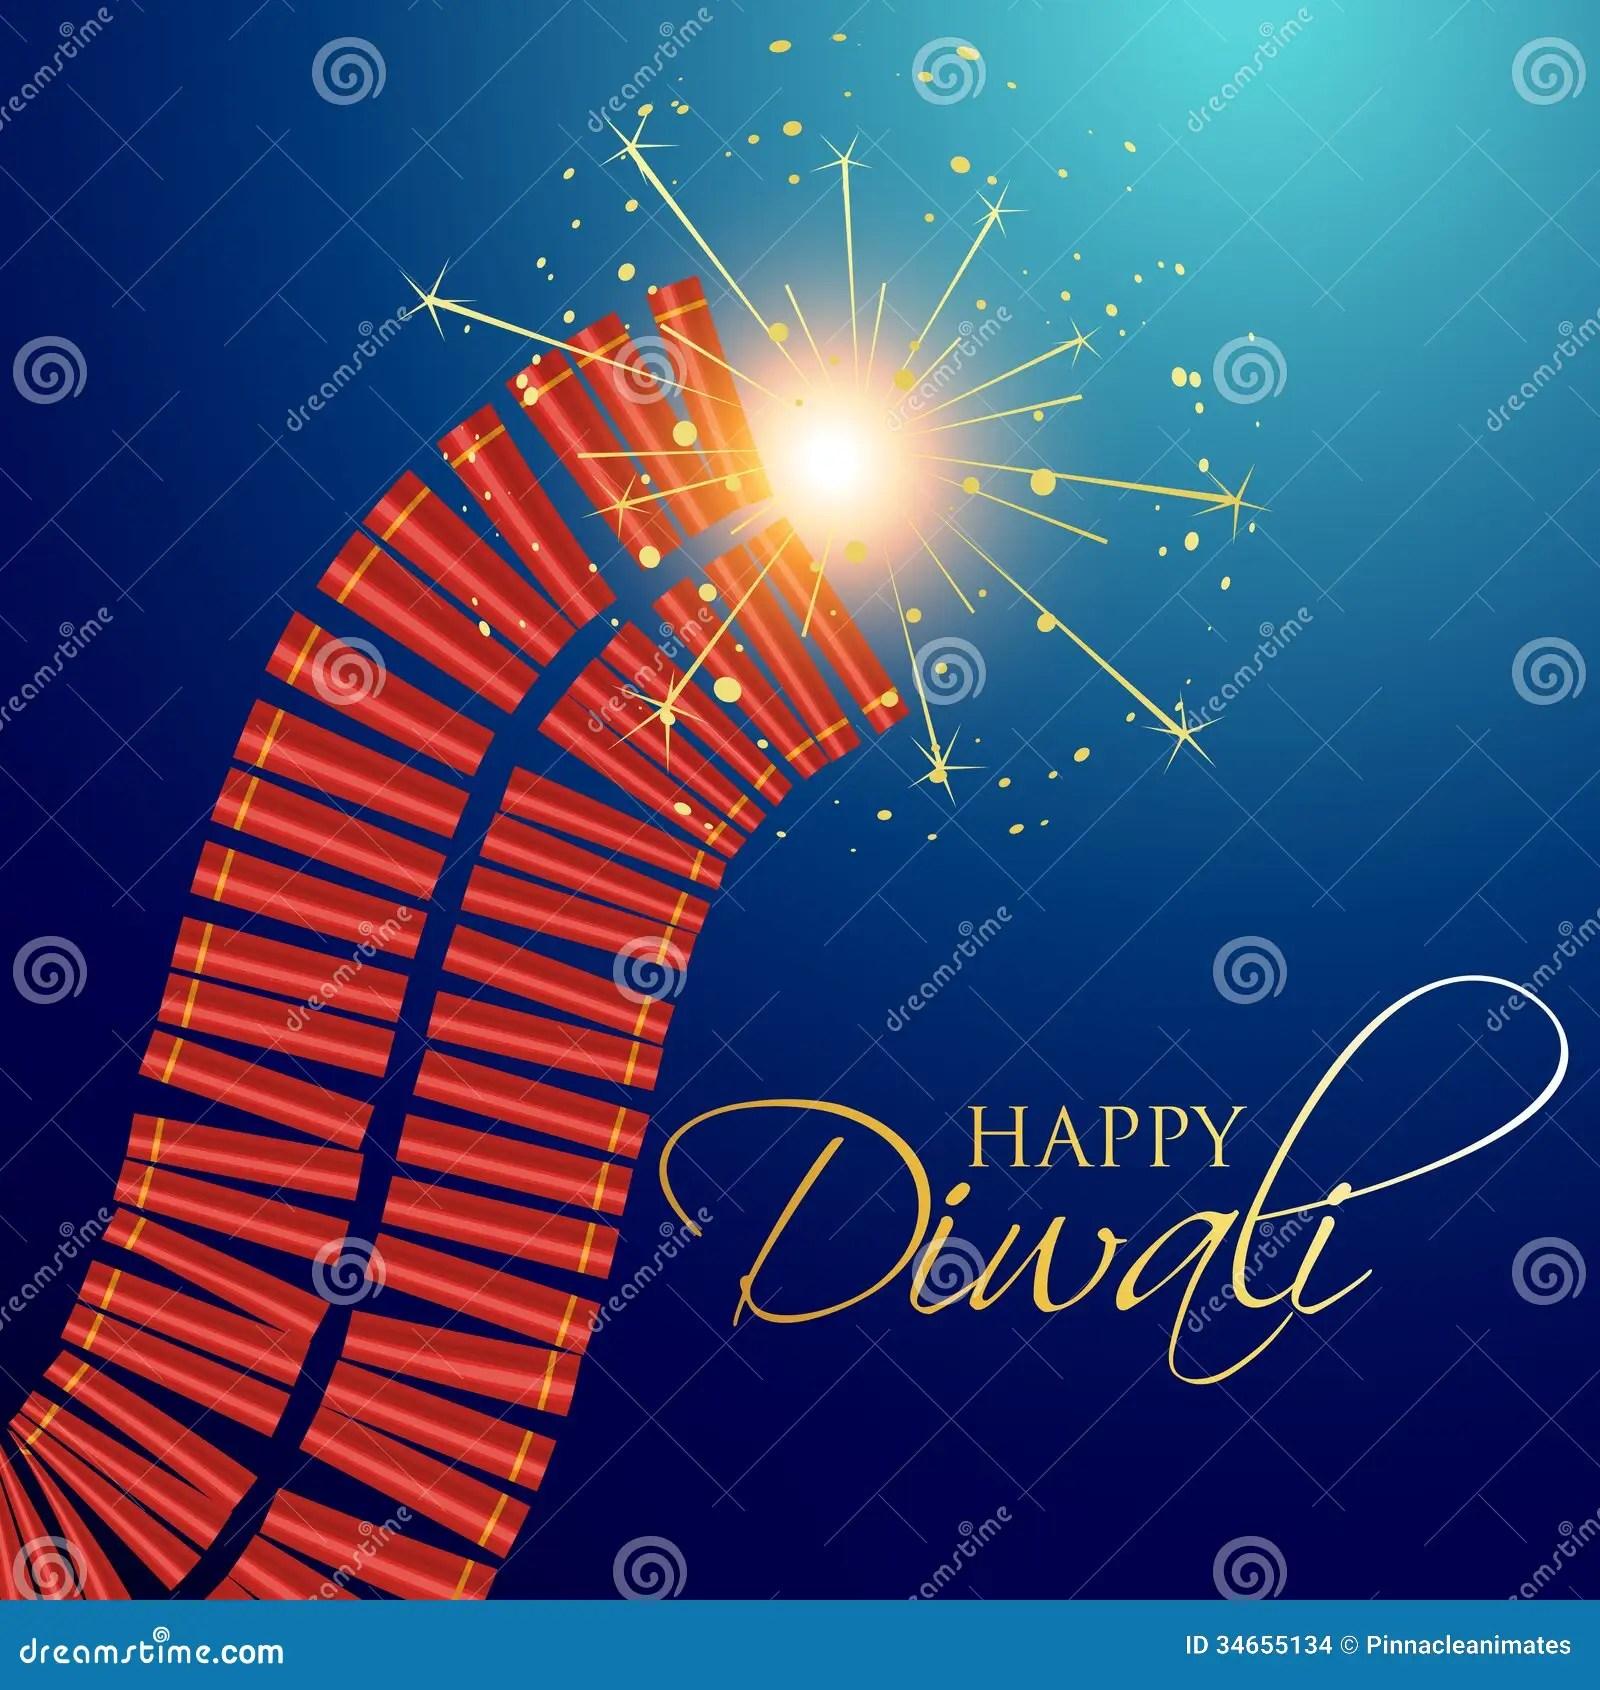 Free Download Wallpaper 3d Graphic Vector Diwali Crackers Stock Vector Illustration Of Hindu